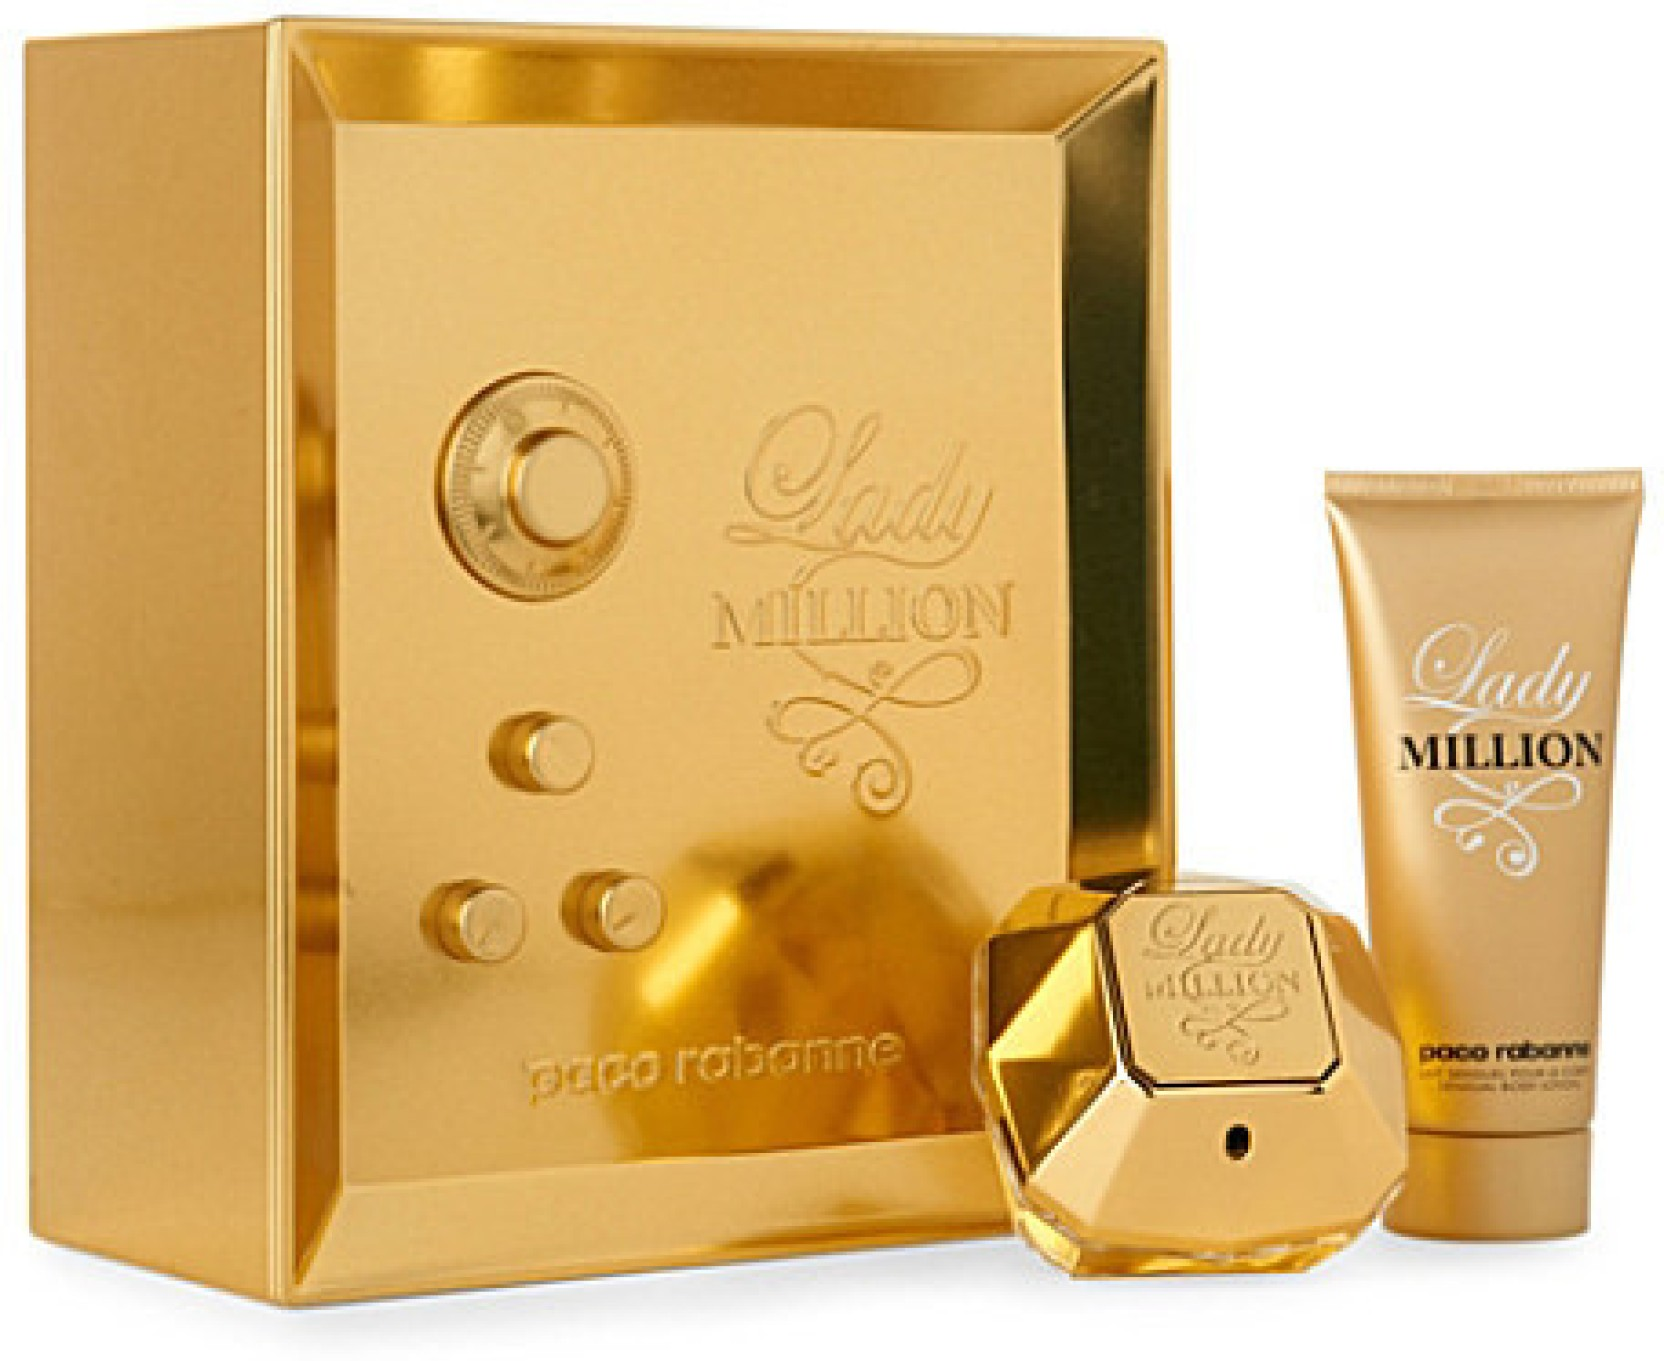 Baby Gift Set Flipkart : Paco rabanne lady million gift set price in india buy